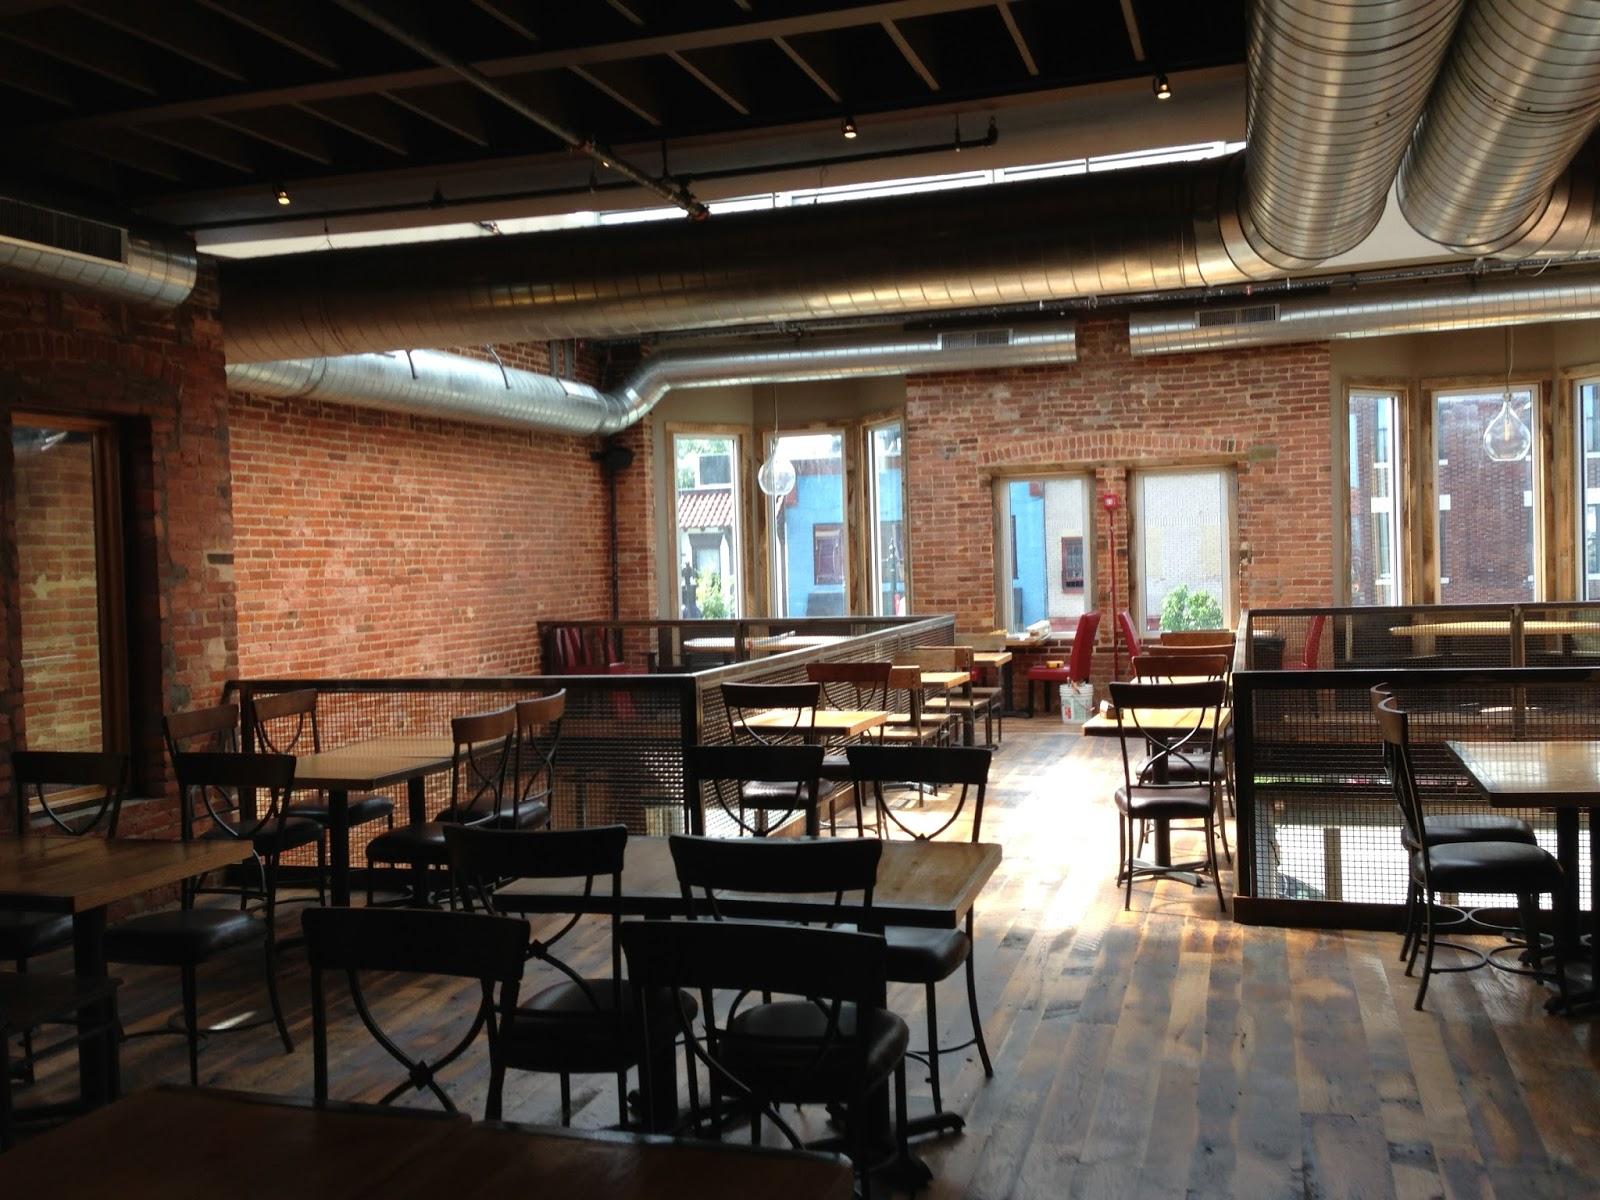 H Street Great Street Redrocks Pizzeria Opening Next Week